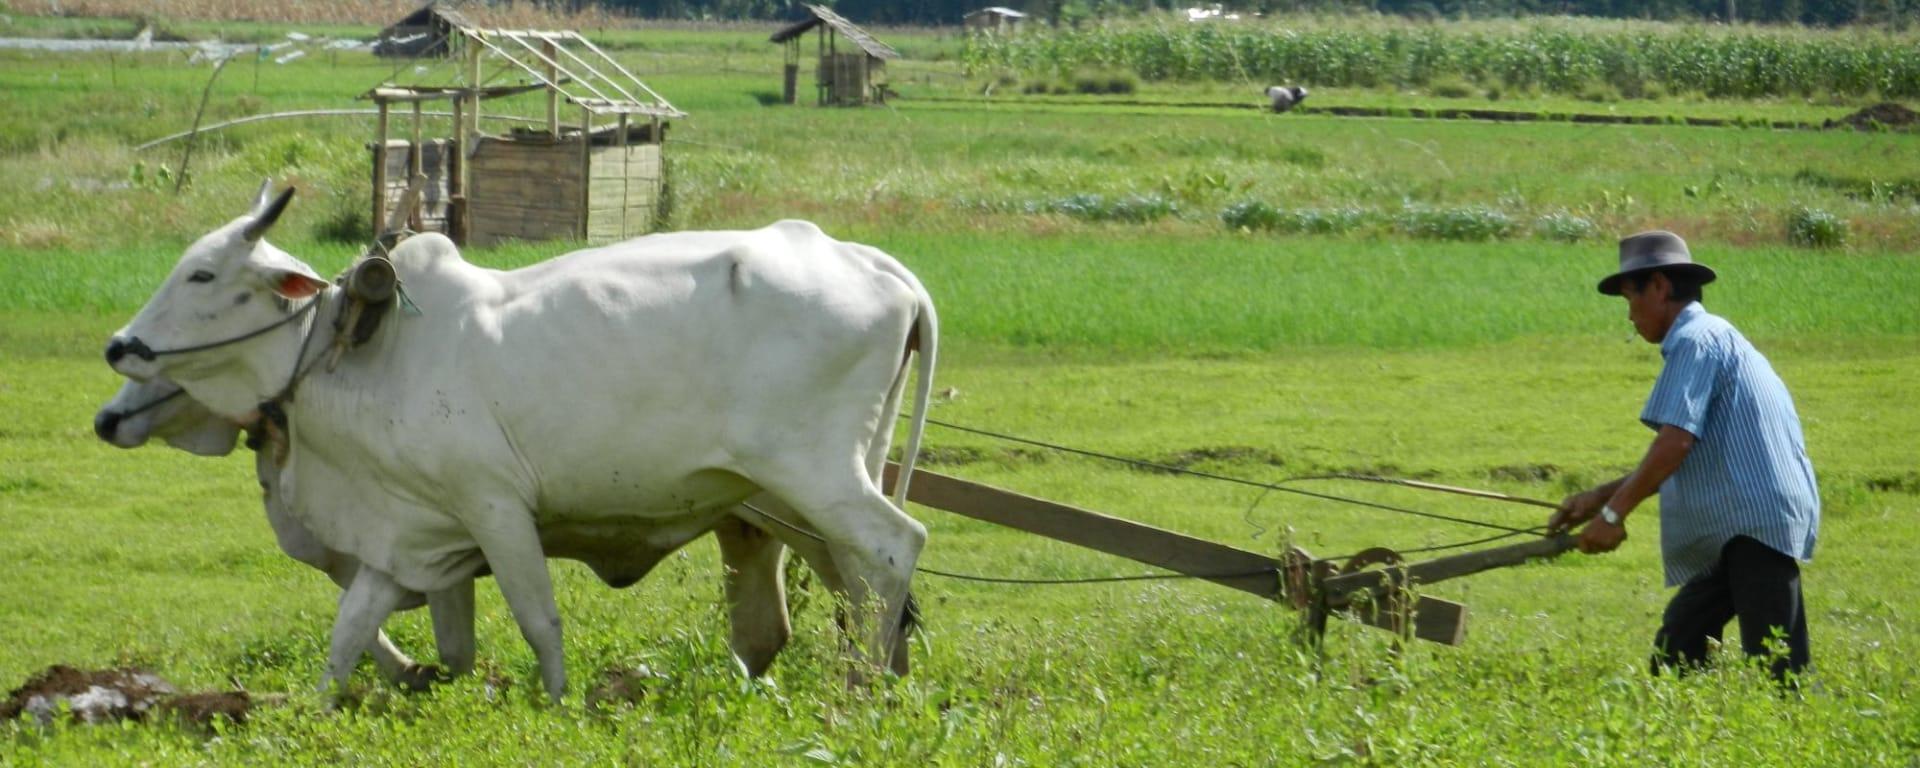 Im Hochland der Minahasa ab Manado: Sulawesi Minahasa farmer in the highlands